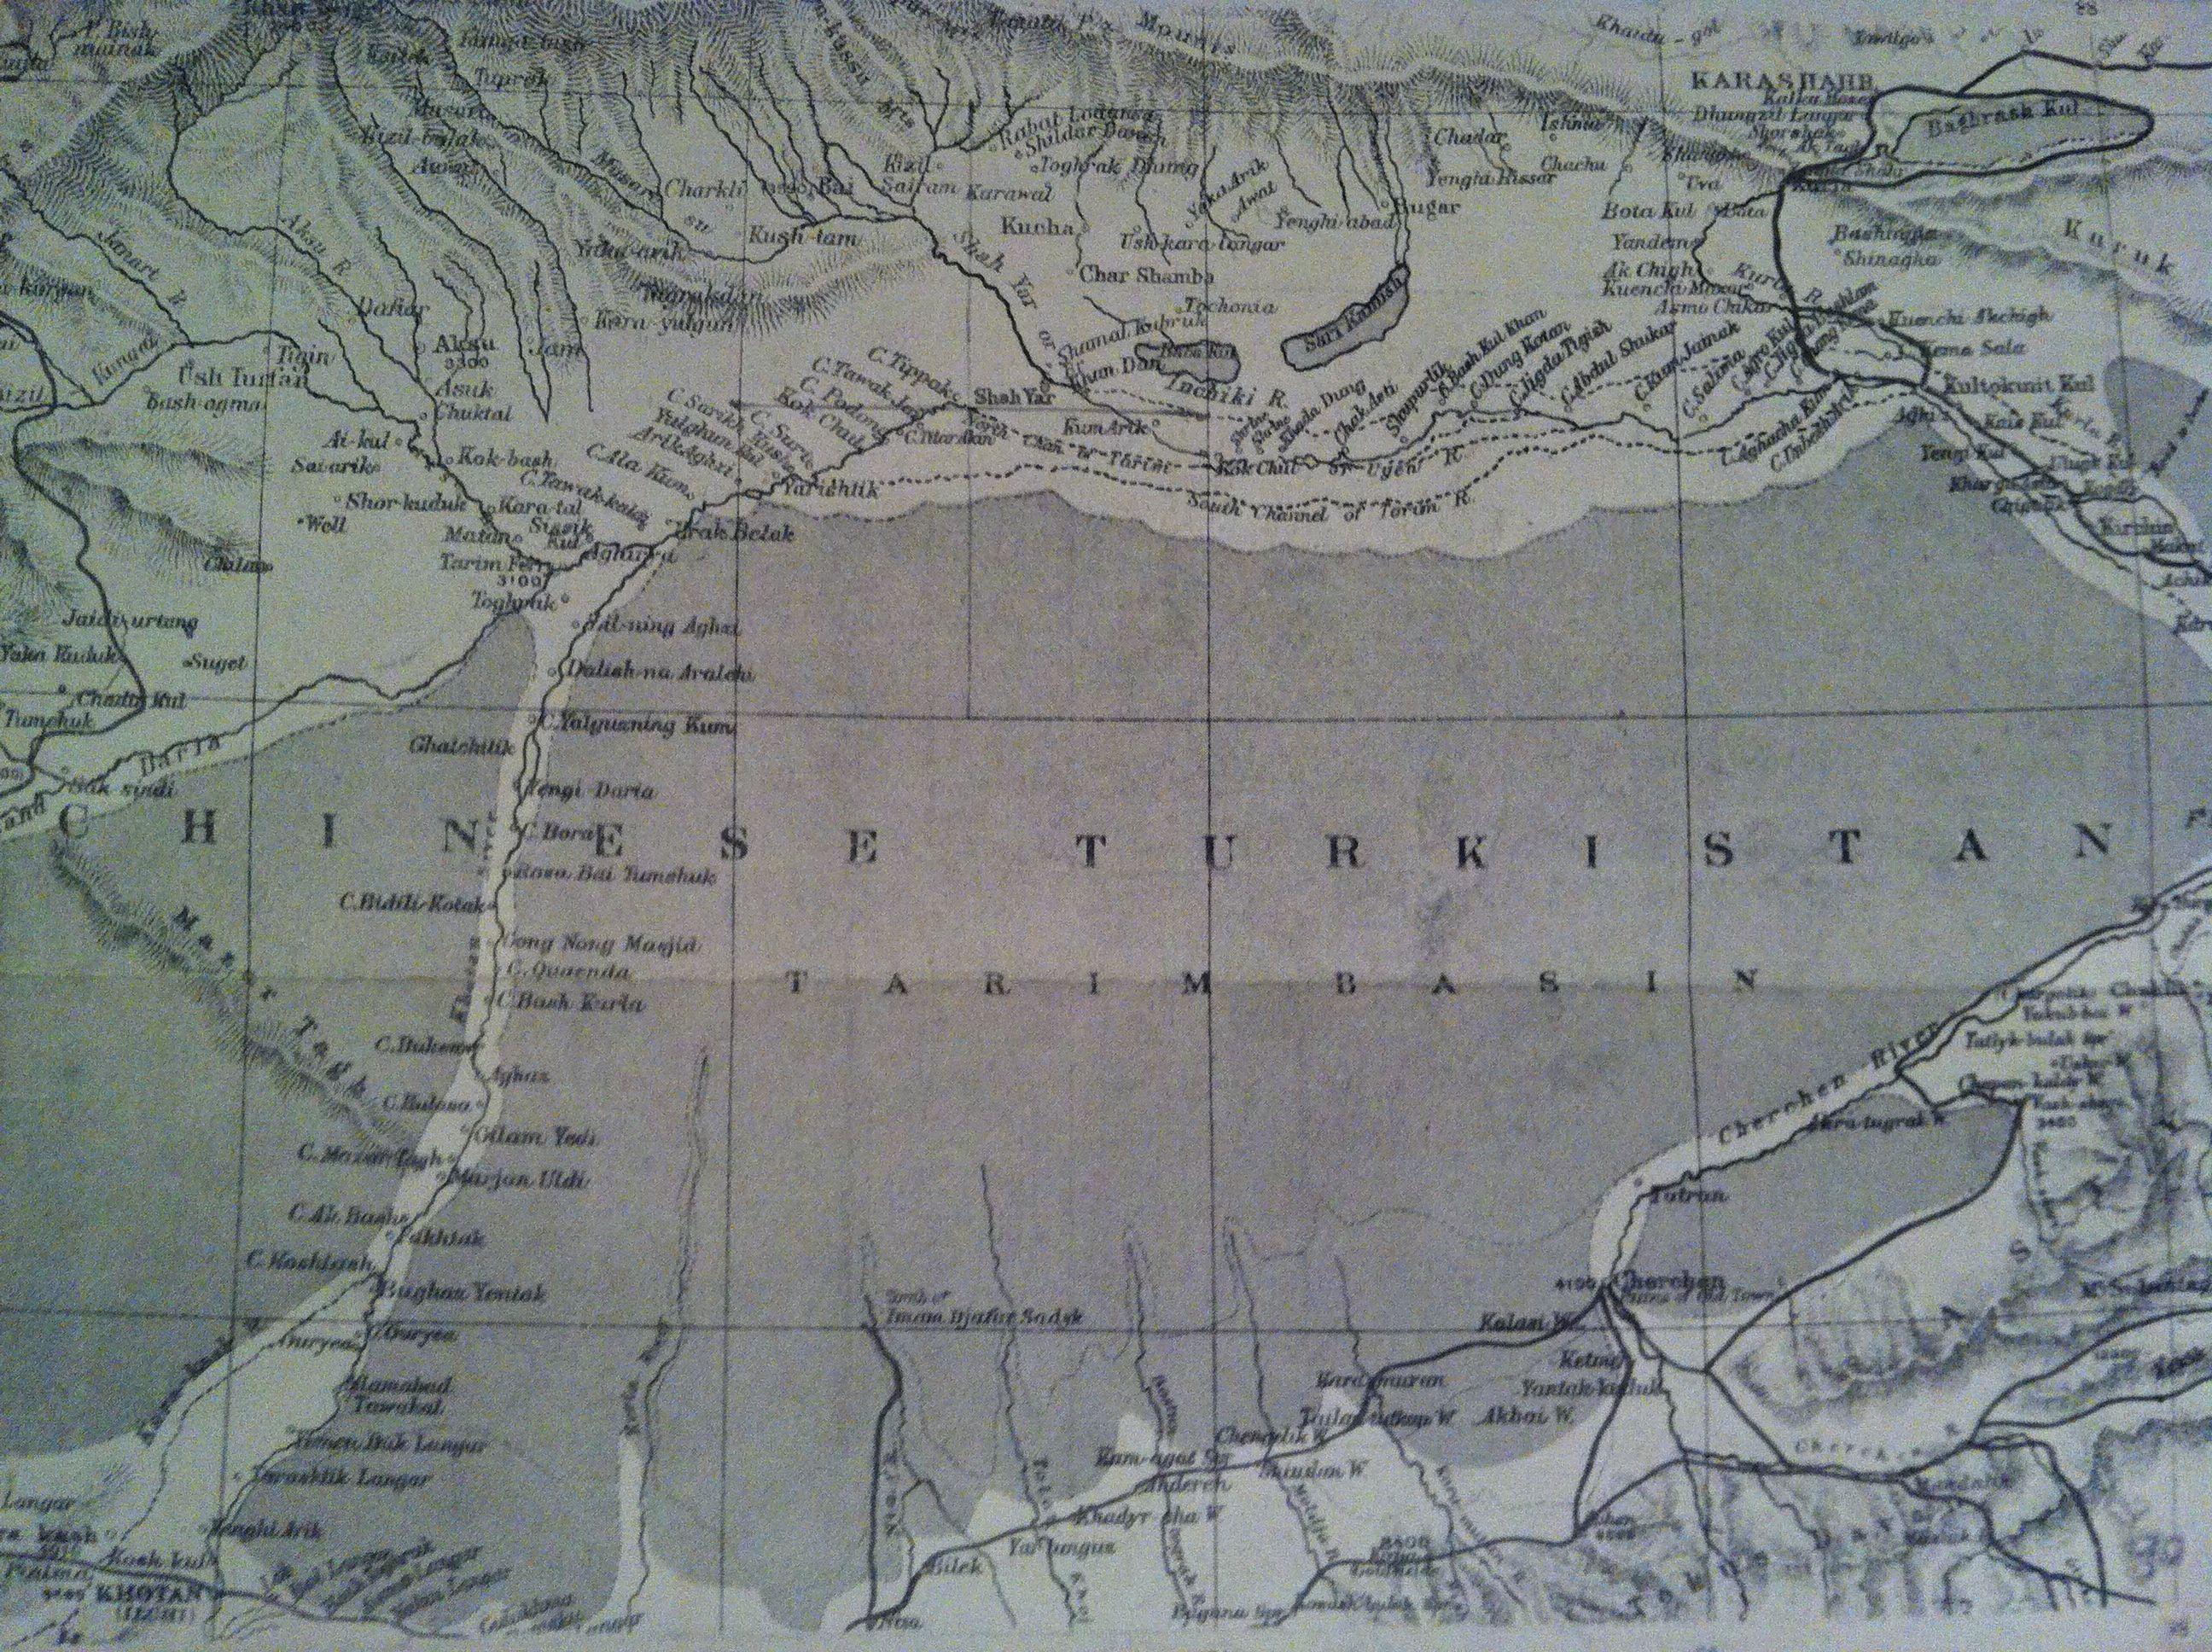 Sketch I Sketch Map of Taklamakan Desert